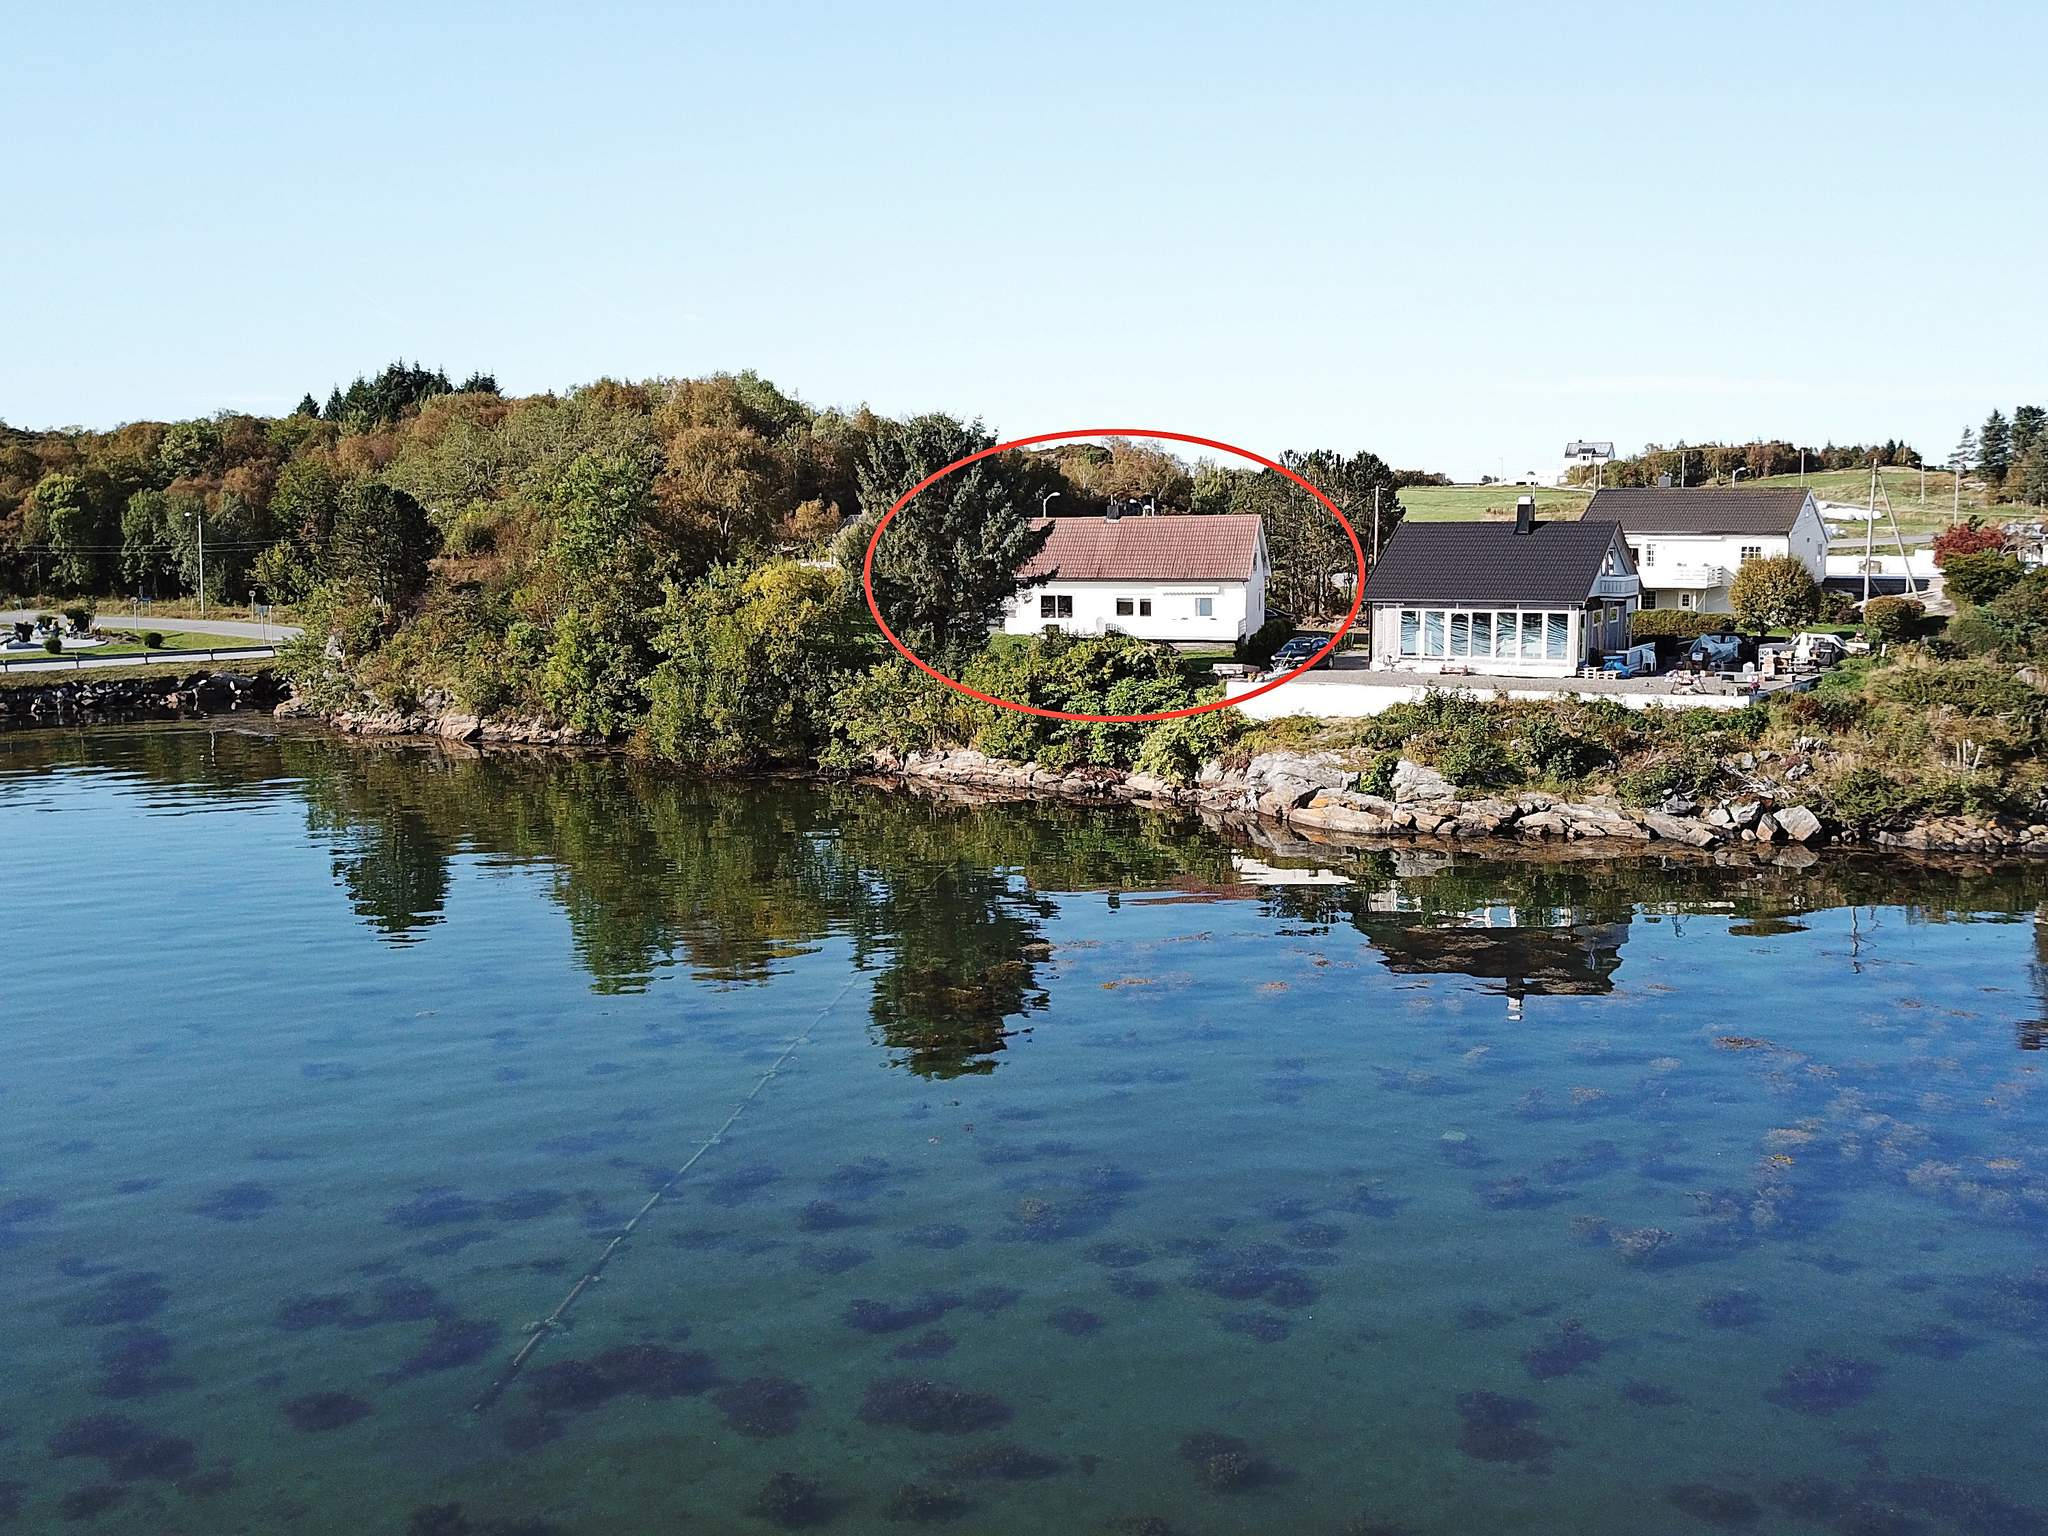 Ferienhaus Vevang (85080), Vevang, More - Romsdal, Westnorwegen, Norwegen, Bild 27